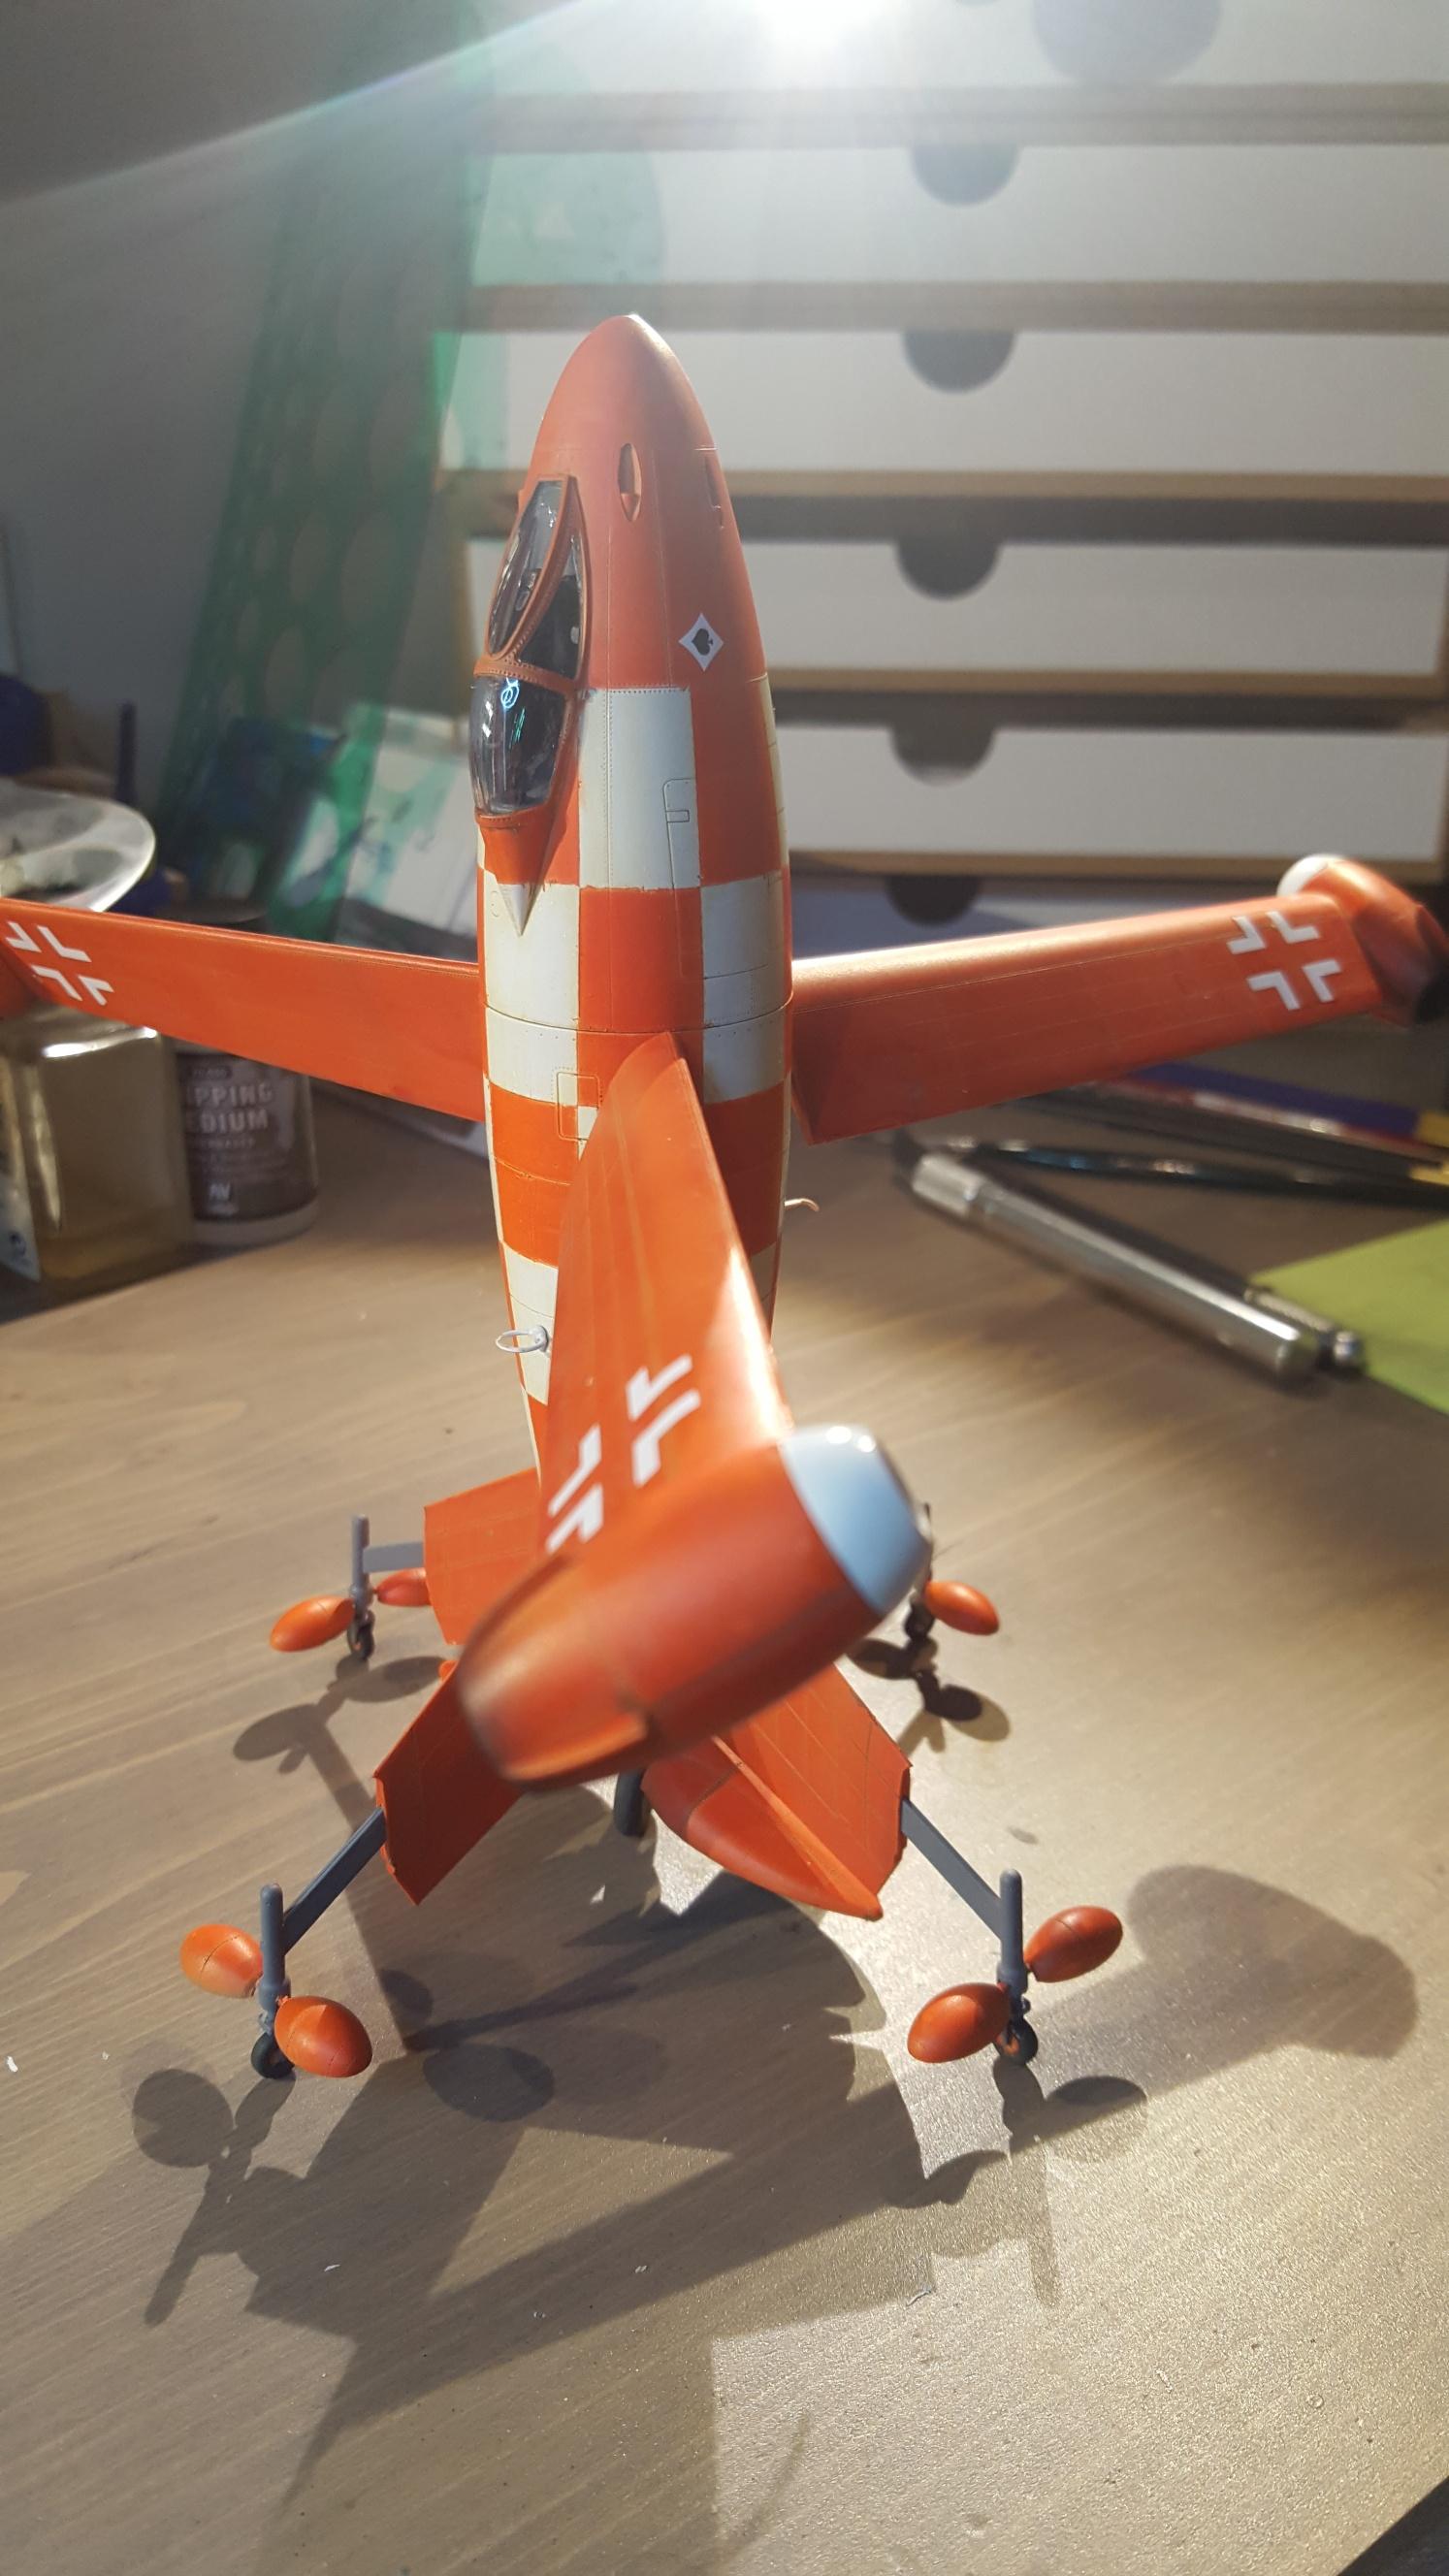 Triebflugel2.jpg